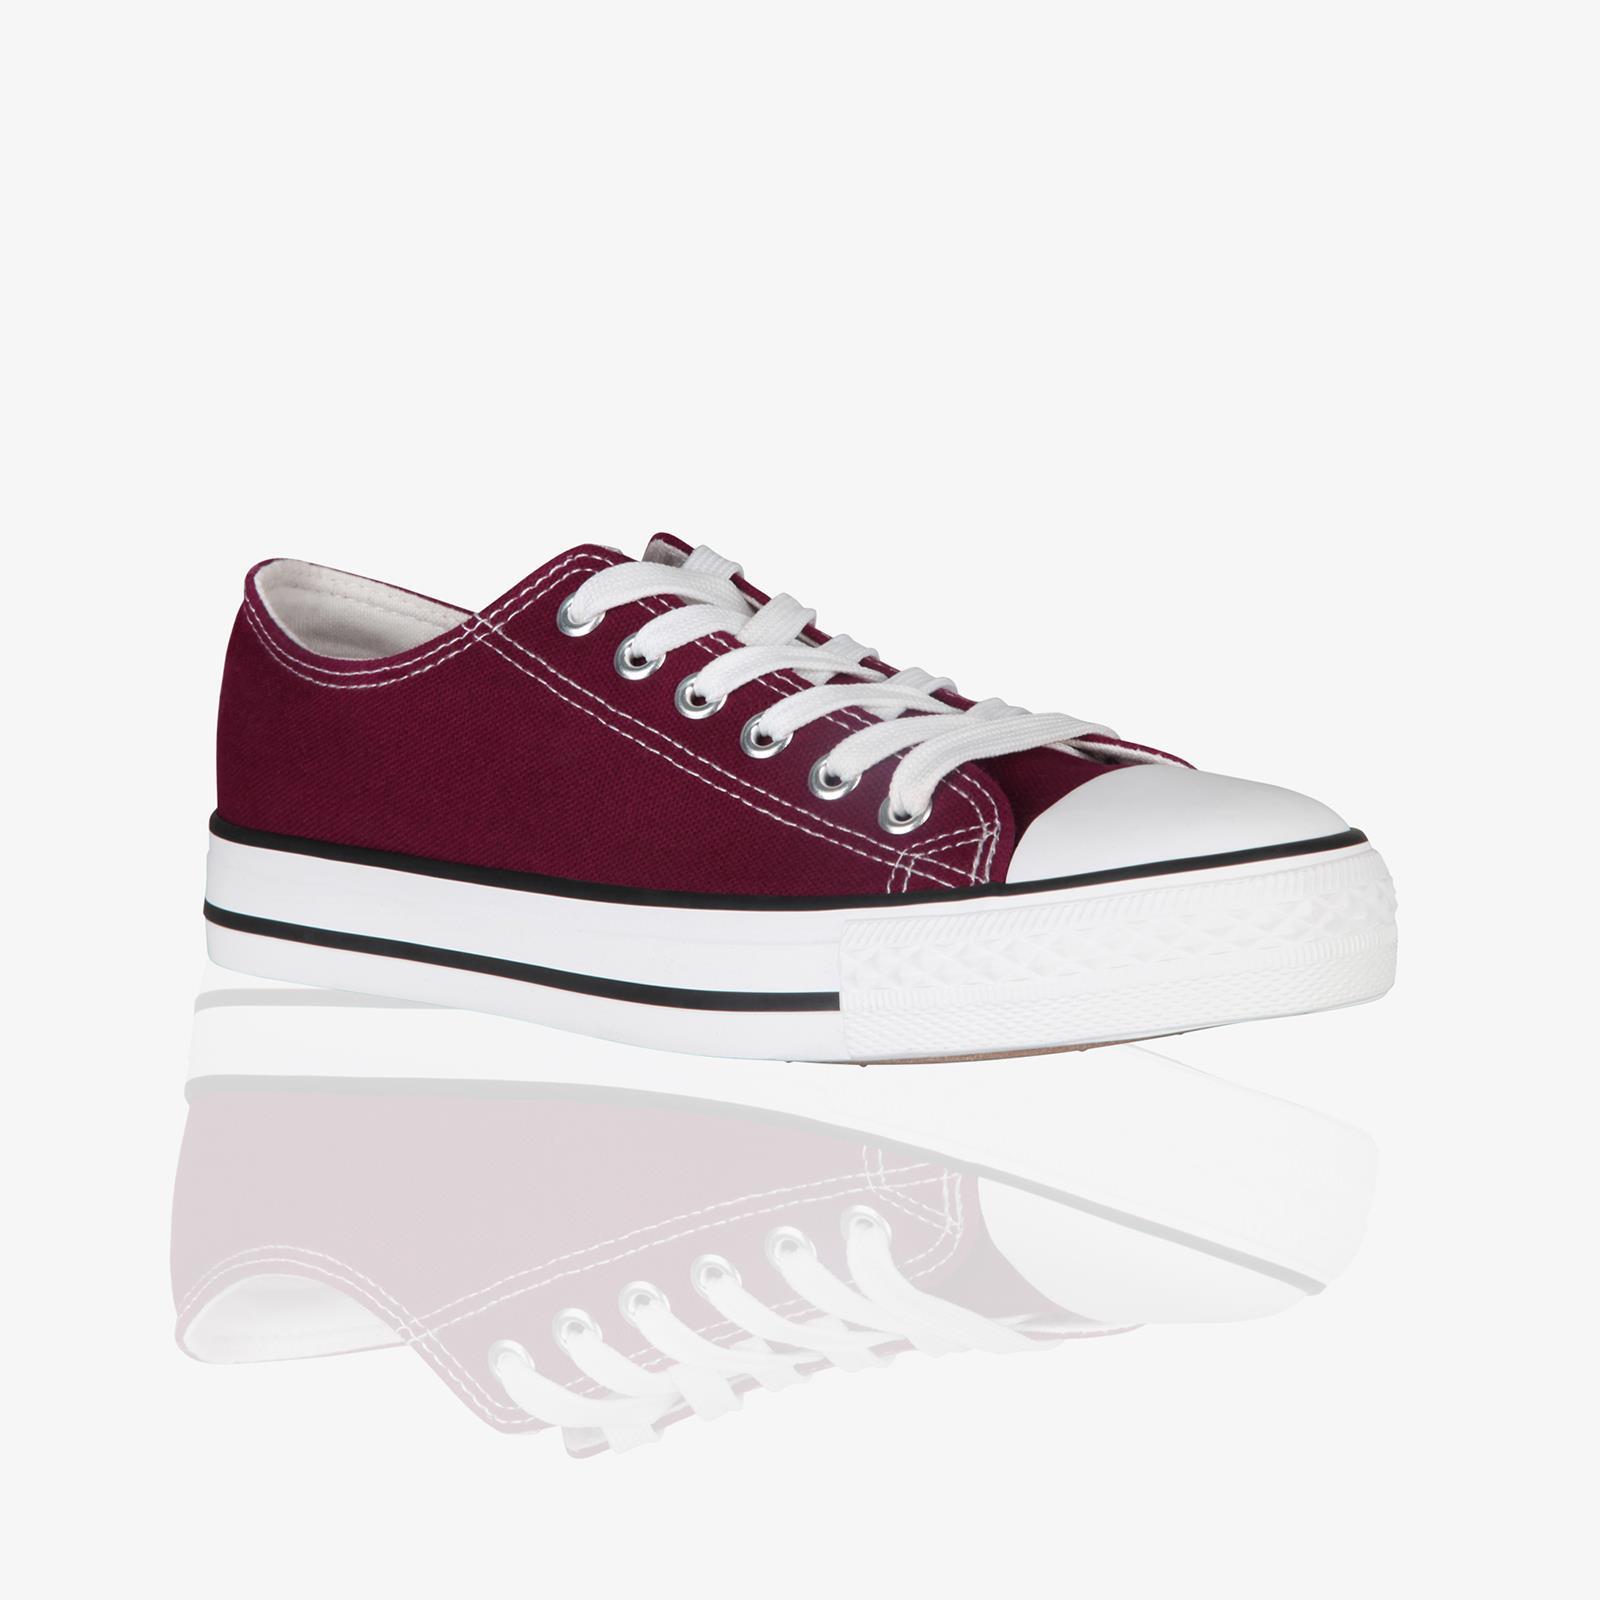 Zapatillas-Mujer-Casuales-Deportiva-Barata-Lona-Moda-Originales-Outlet-Tela-Moda miniatura 13